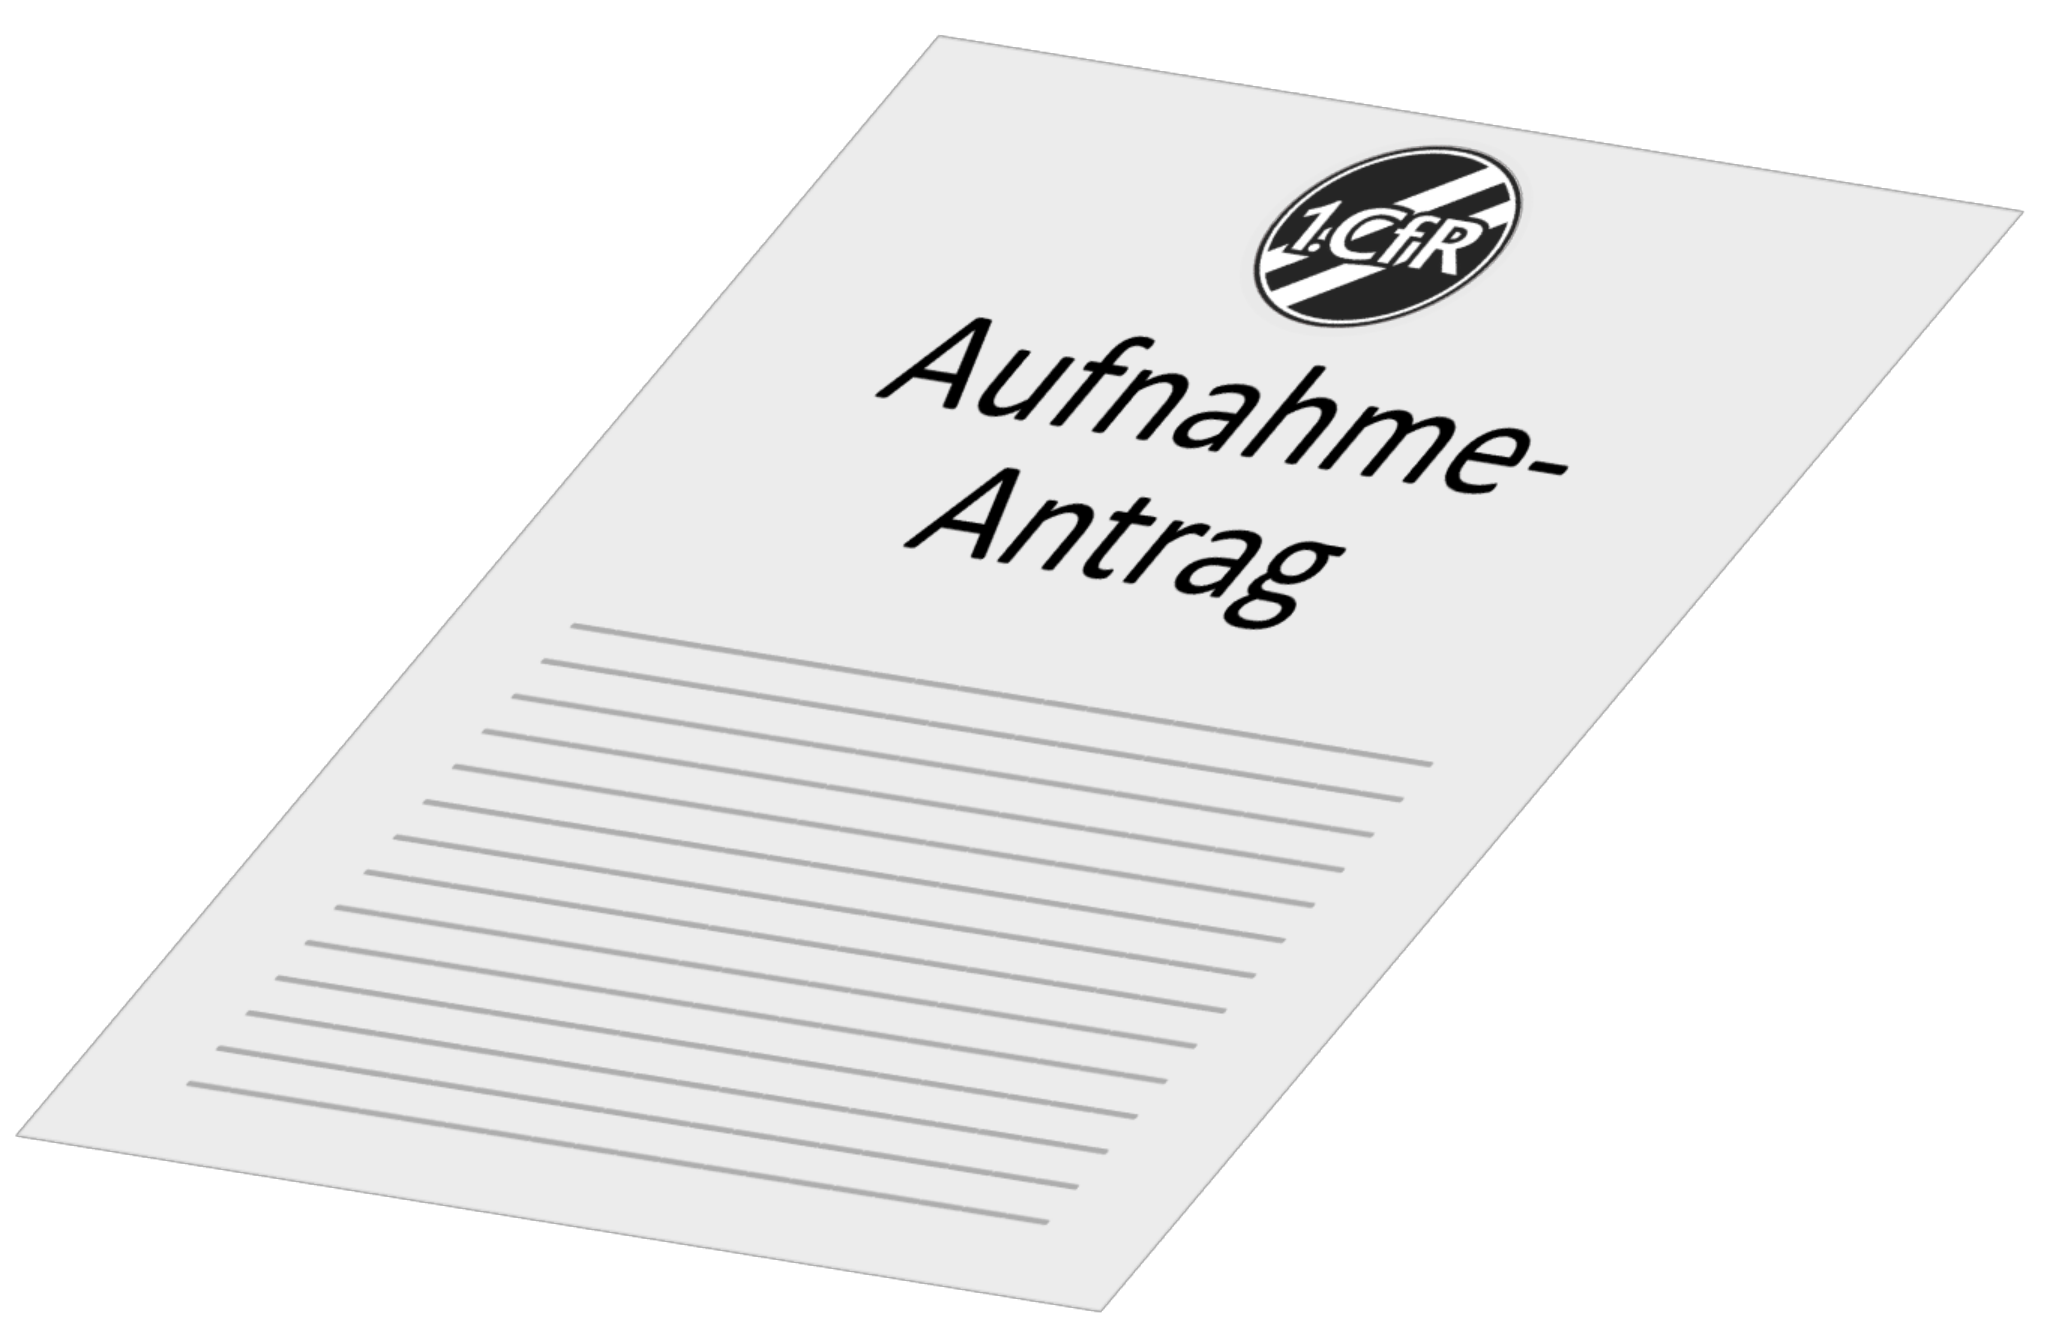 Mitglieds-Aufnahmeantrag